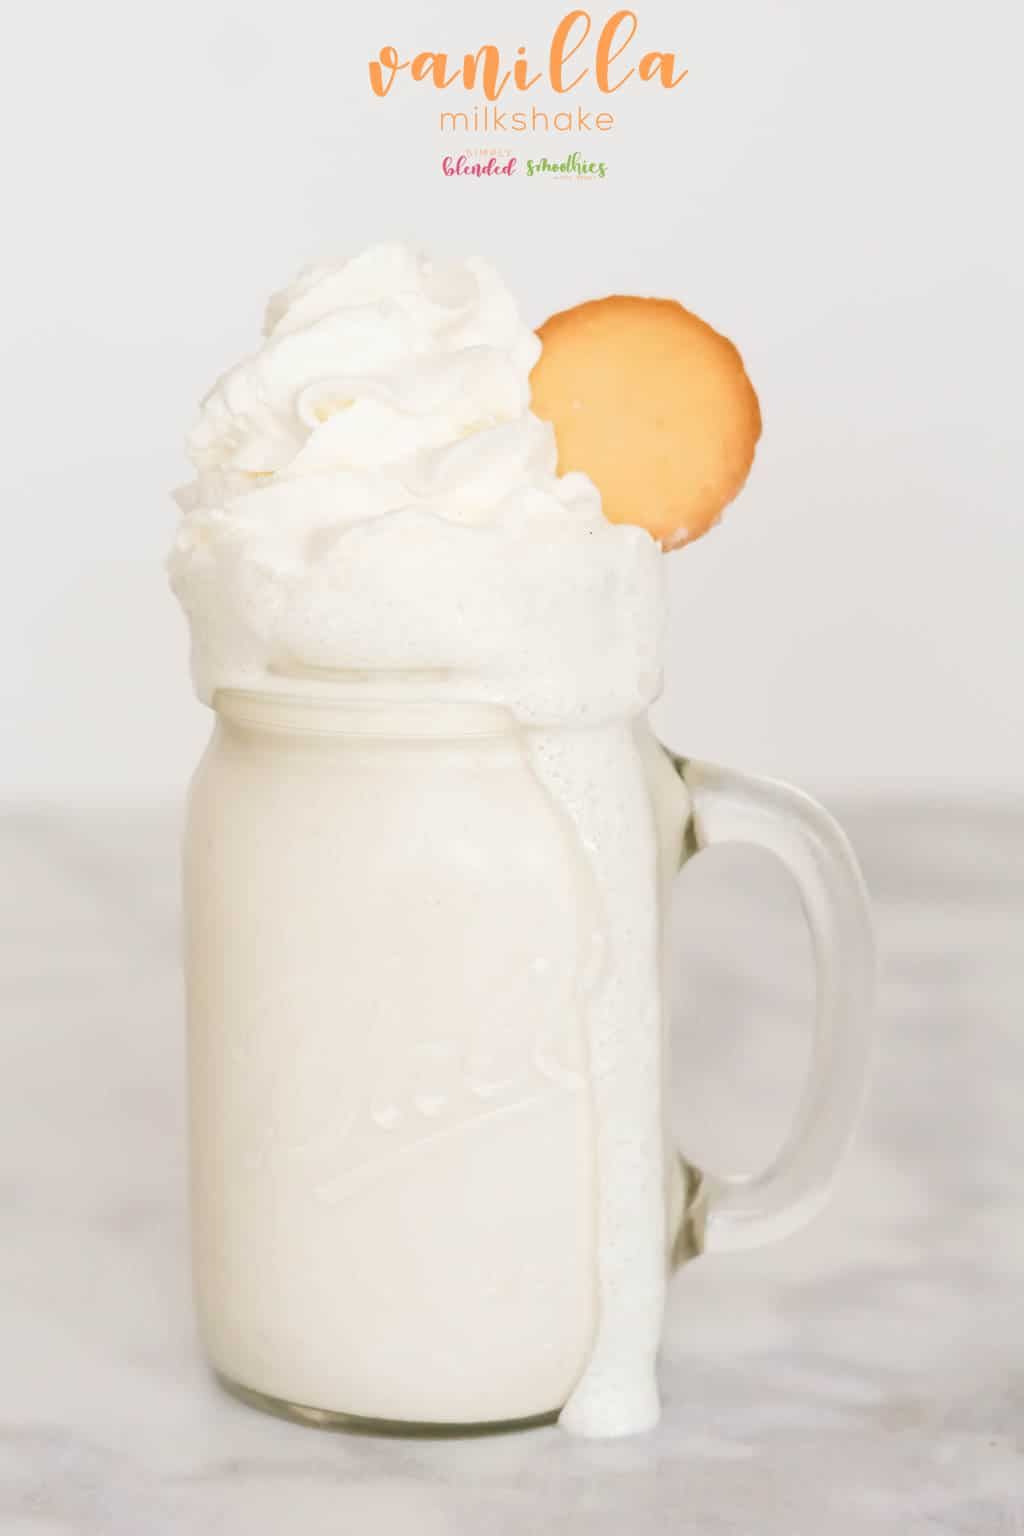 Delicious Vanilla Milkshake